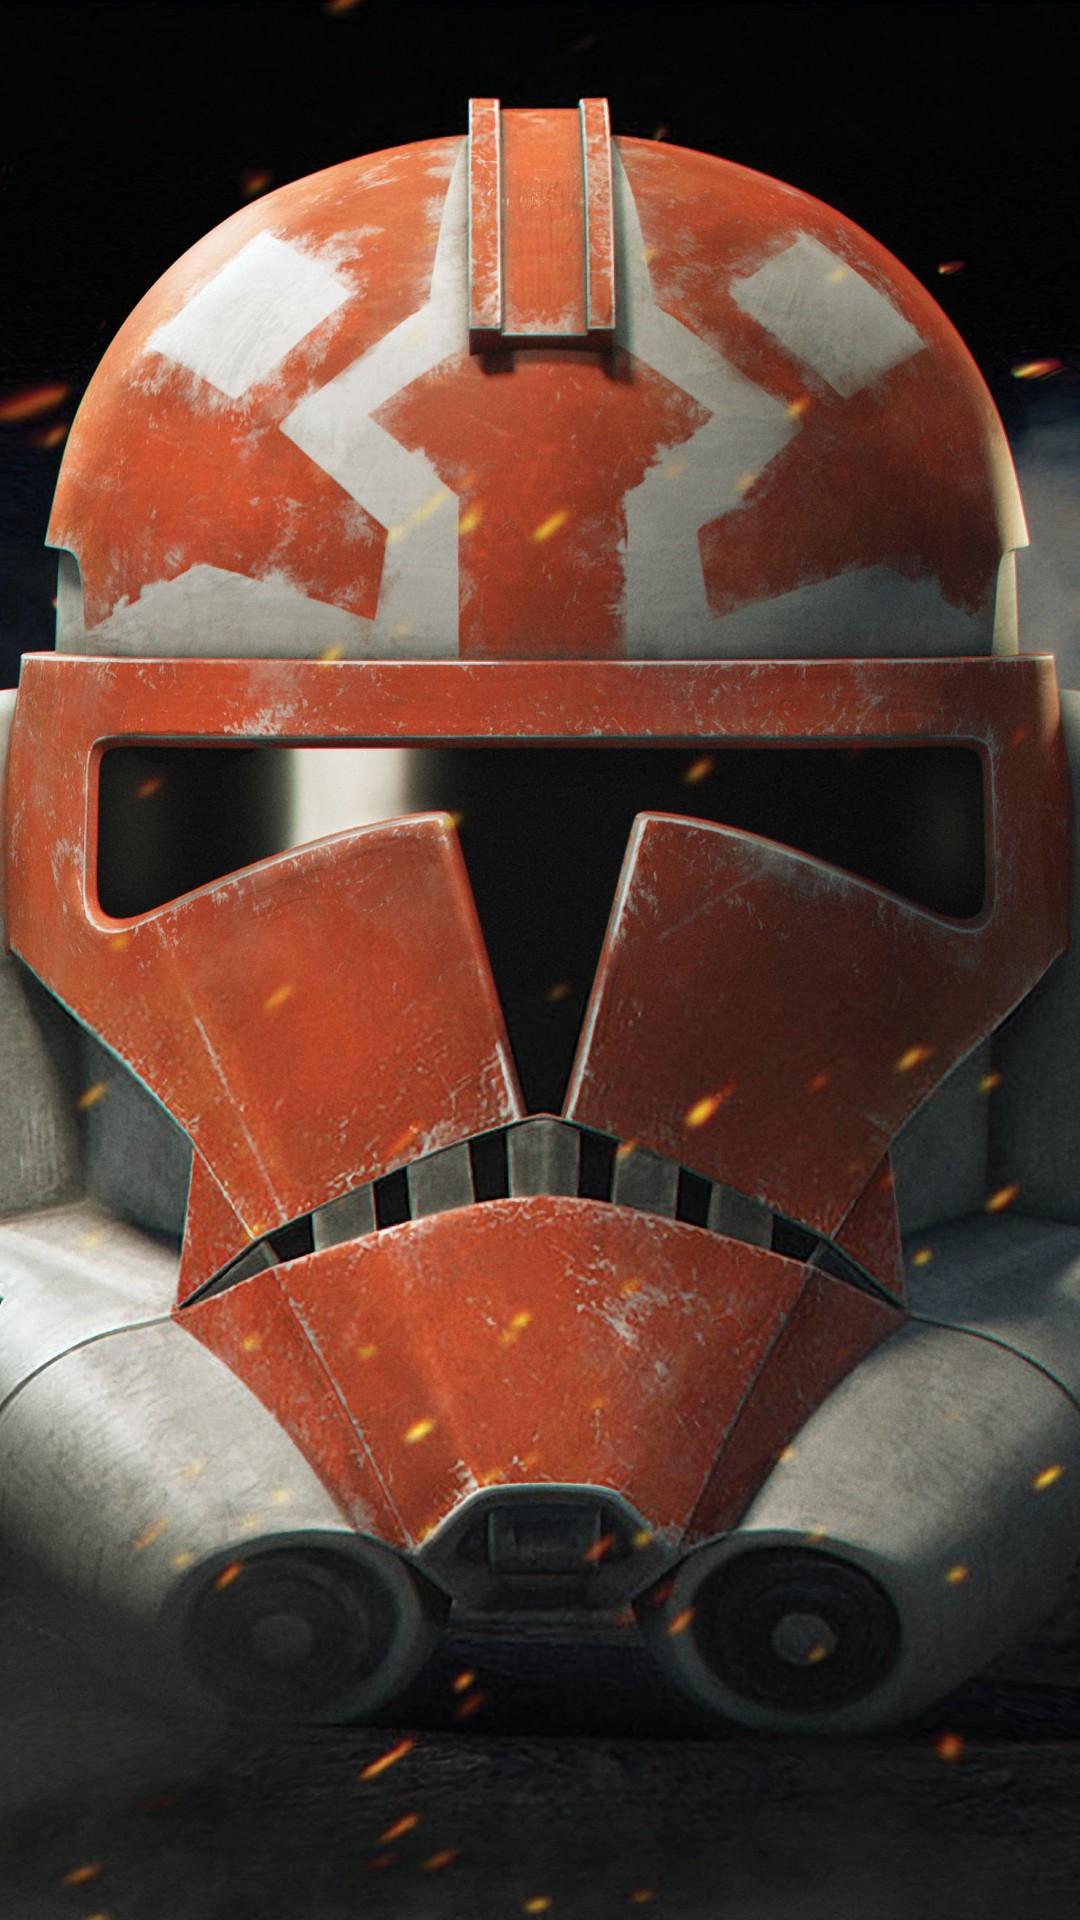 Star Wars The Clone Wars Season 7 1080x1920 Download Hd Wallpaper Wallpapertip